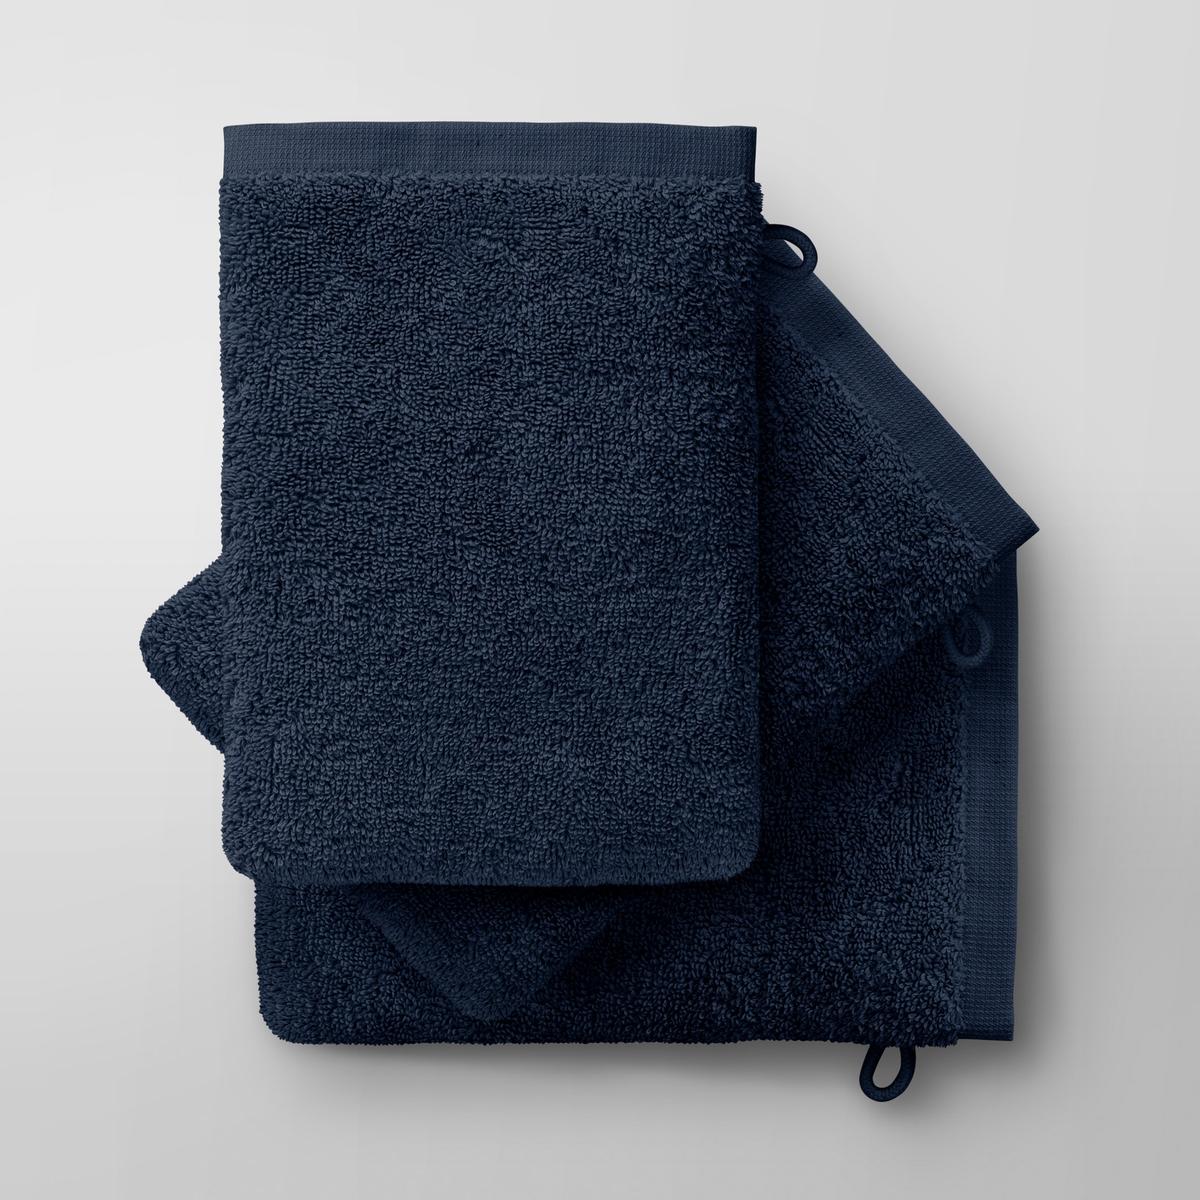 3 рукавицы банные Gilbear из 100% хлопка